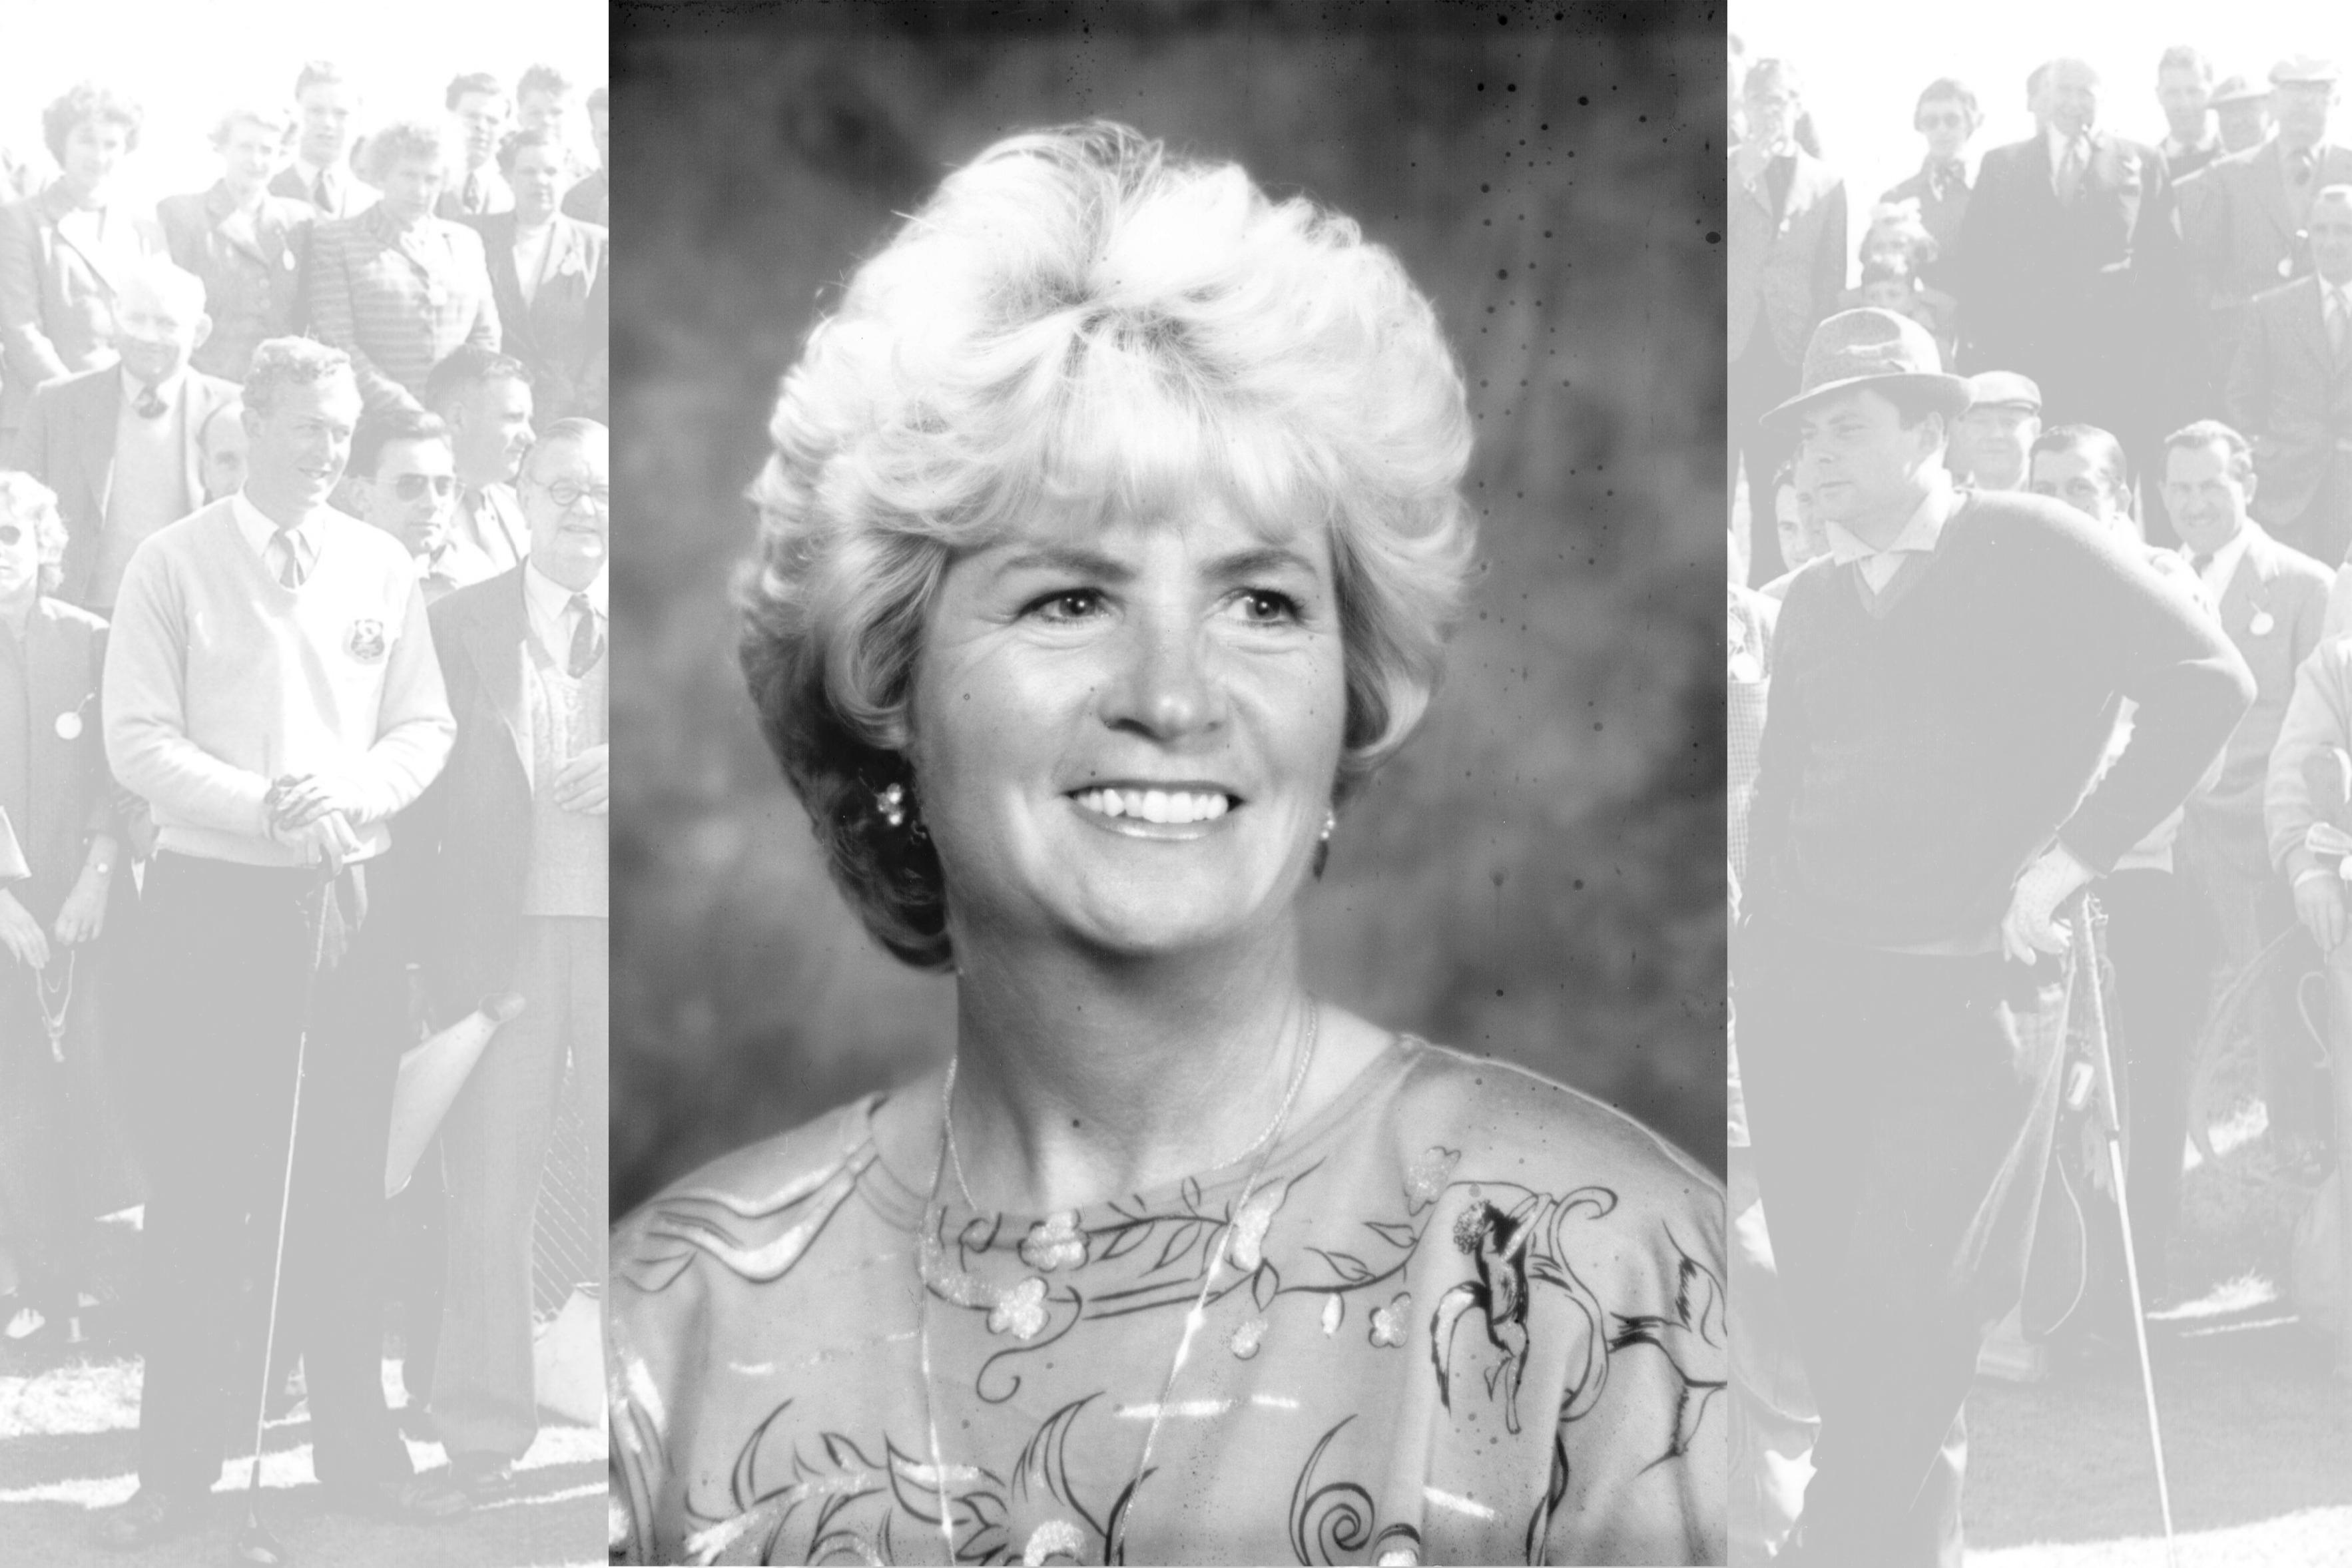 1989 - Margaret Rogers